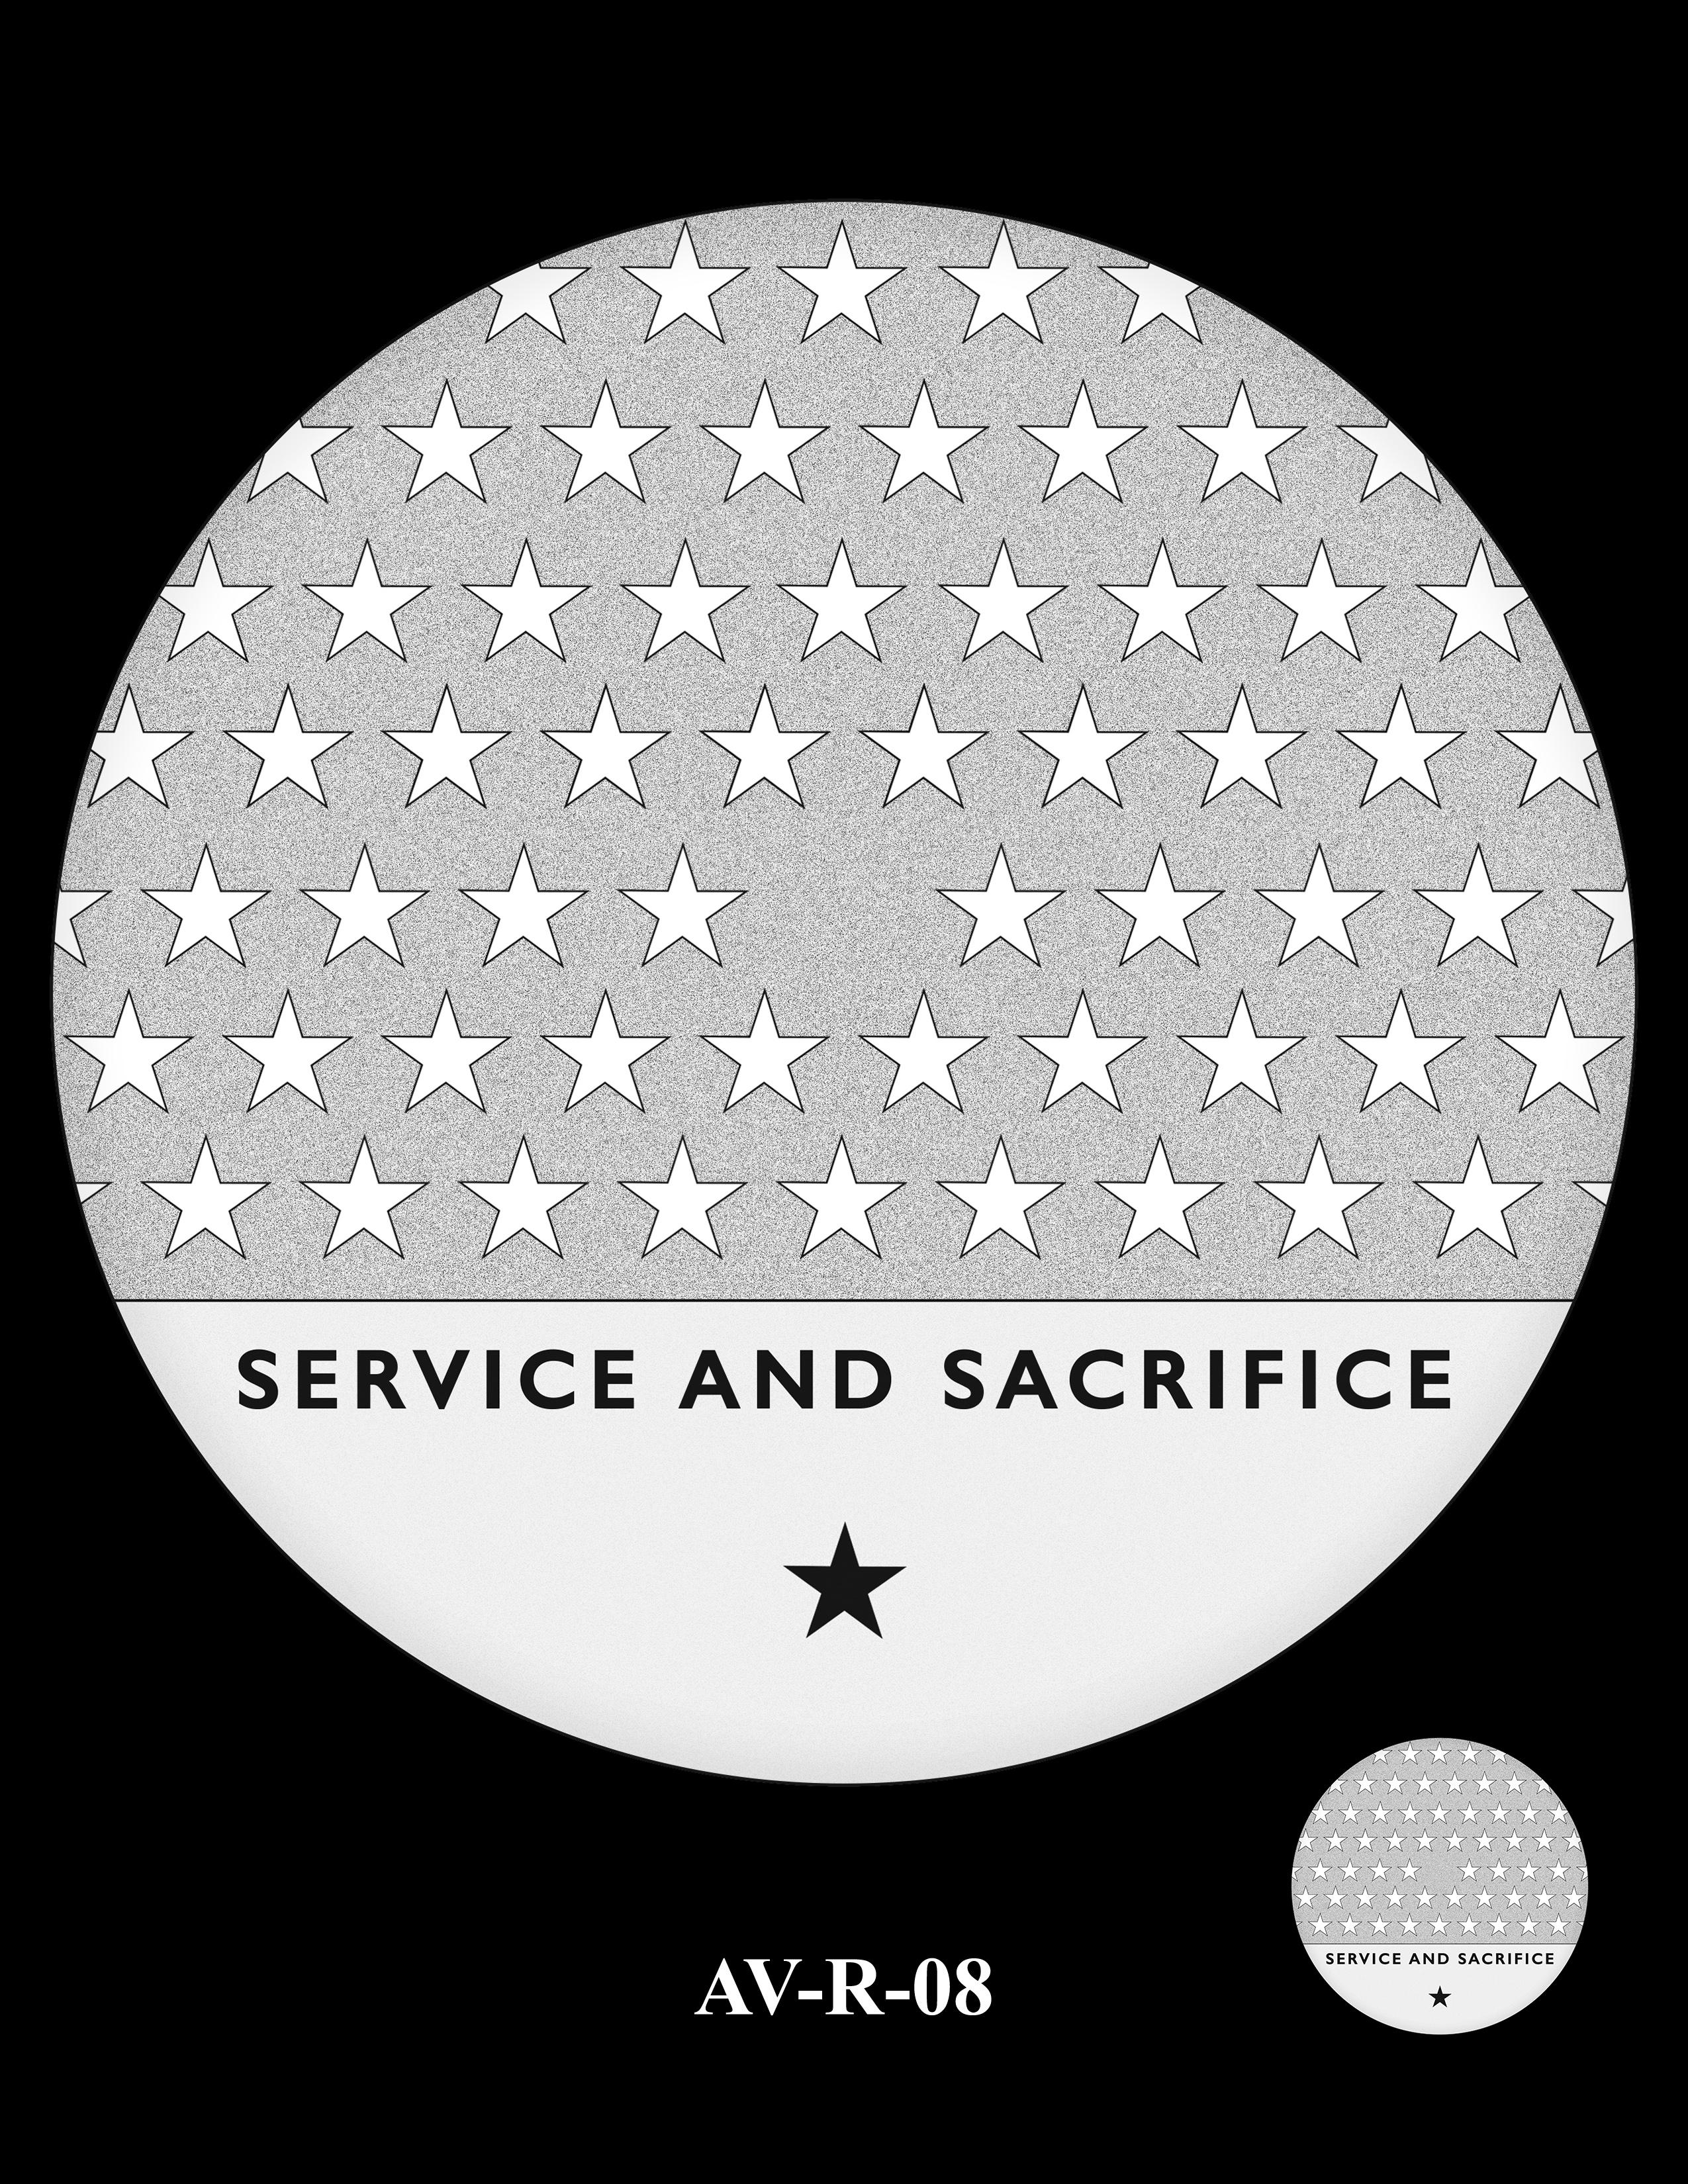 AV-R-08 - American Veterans Medal